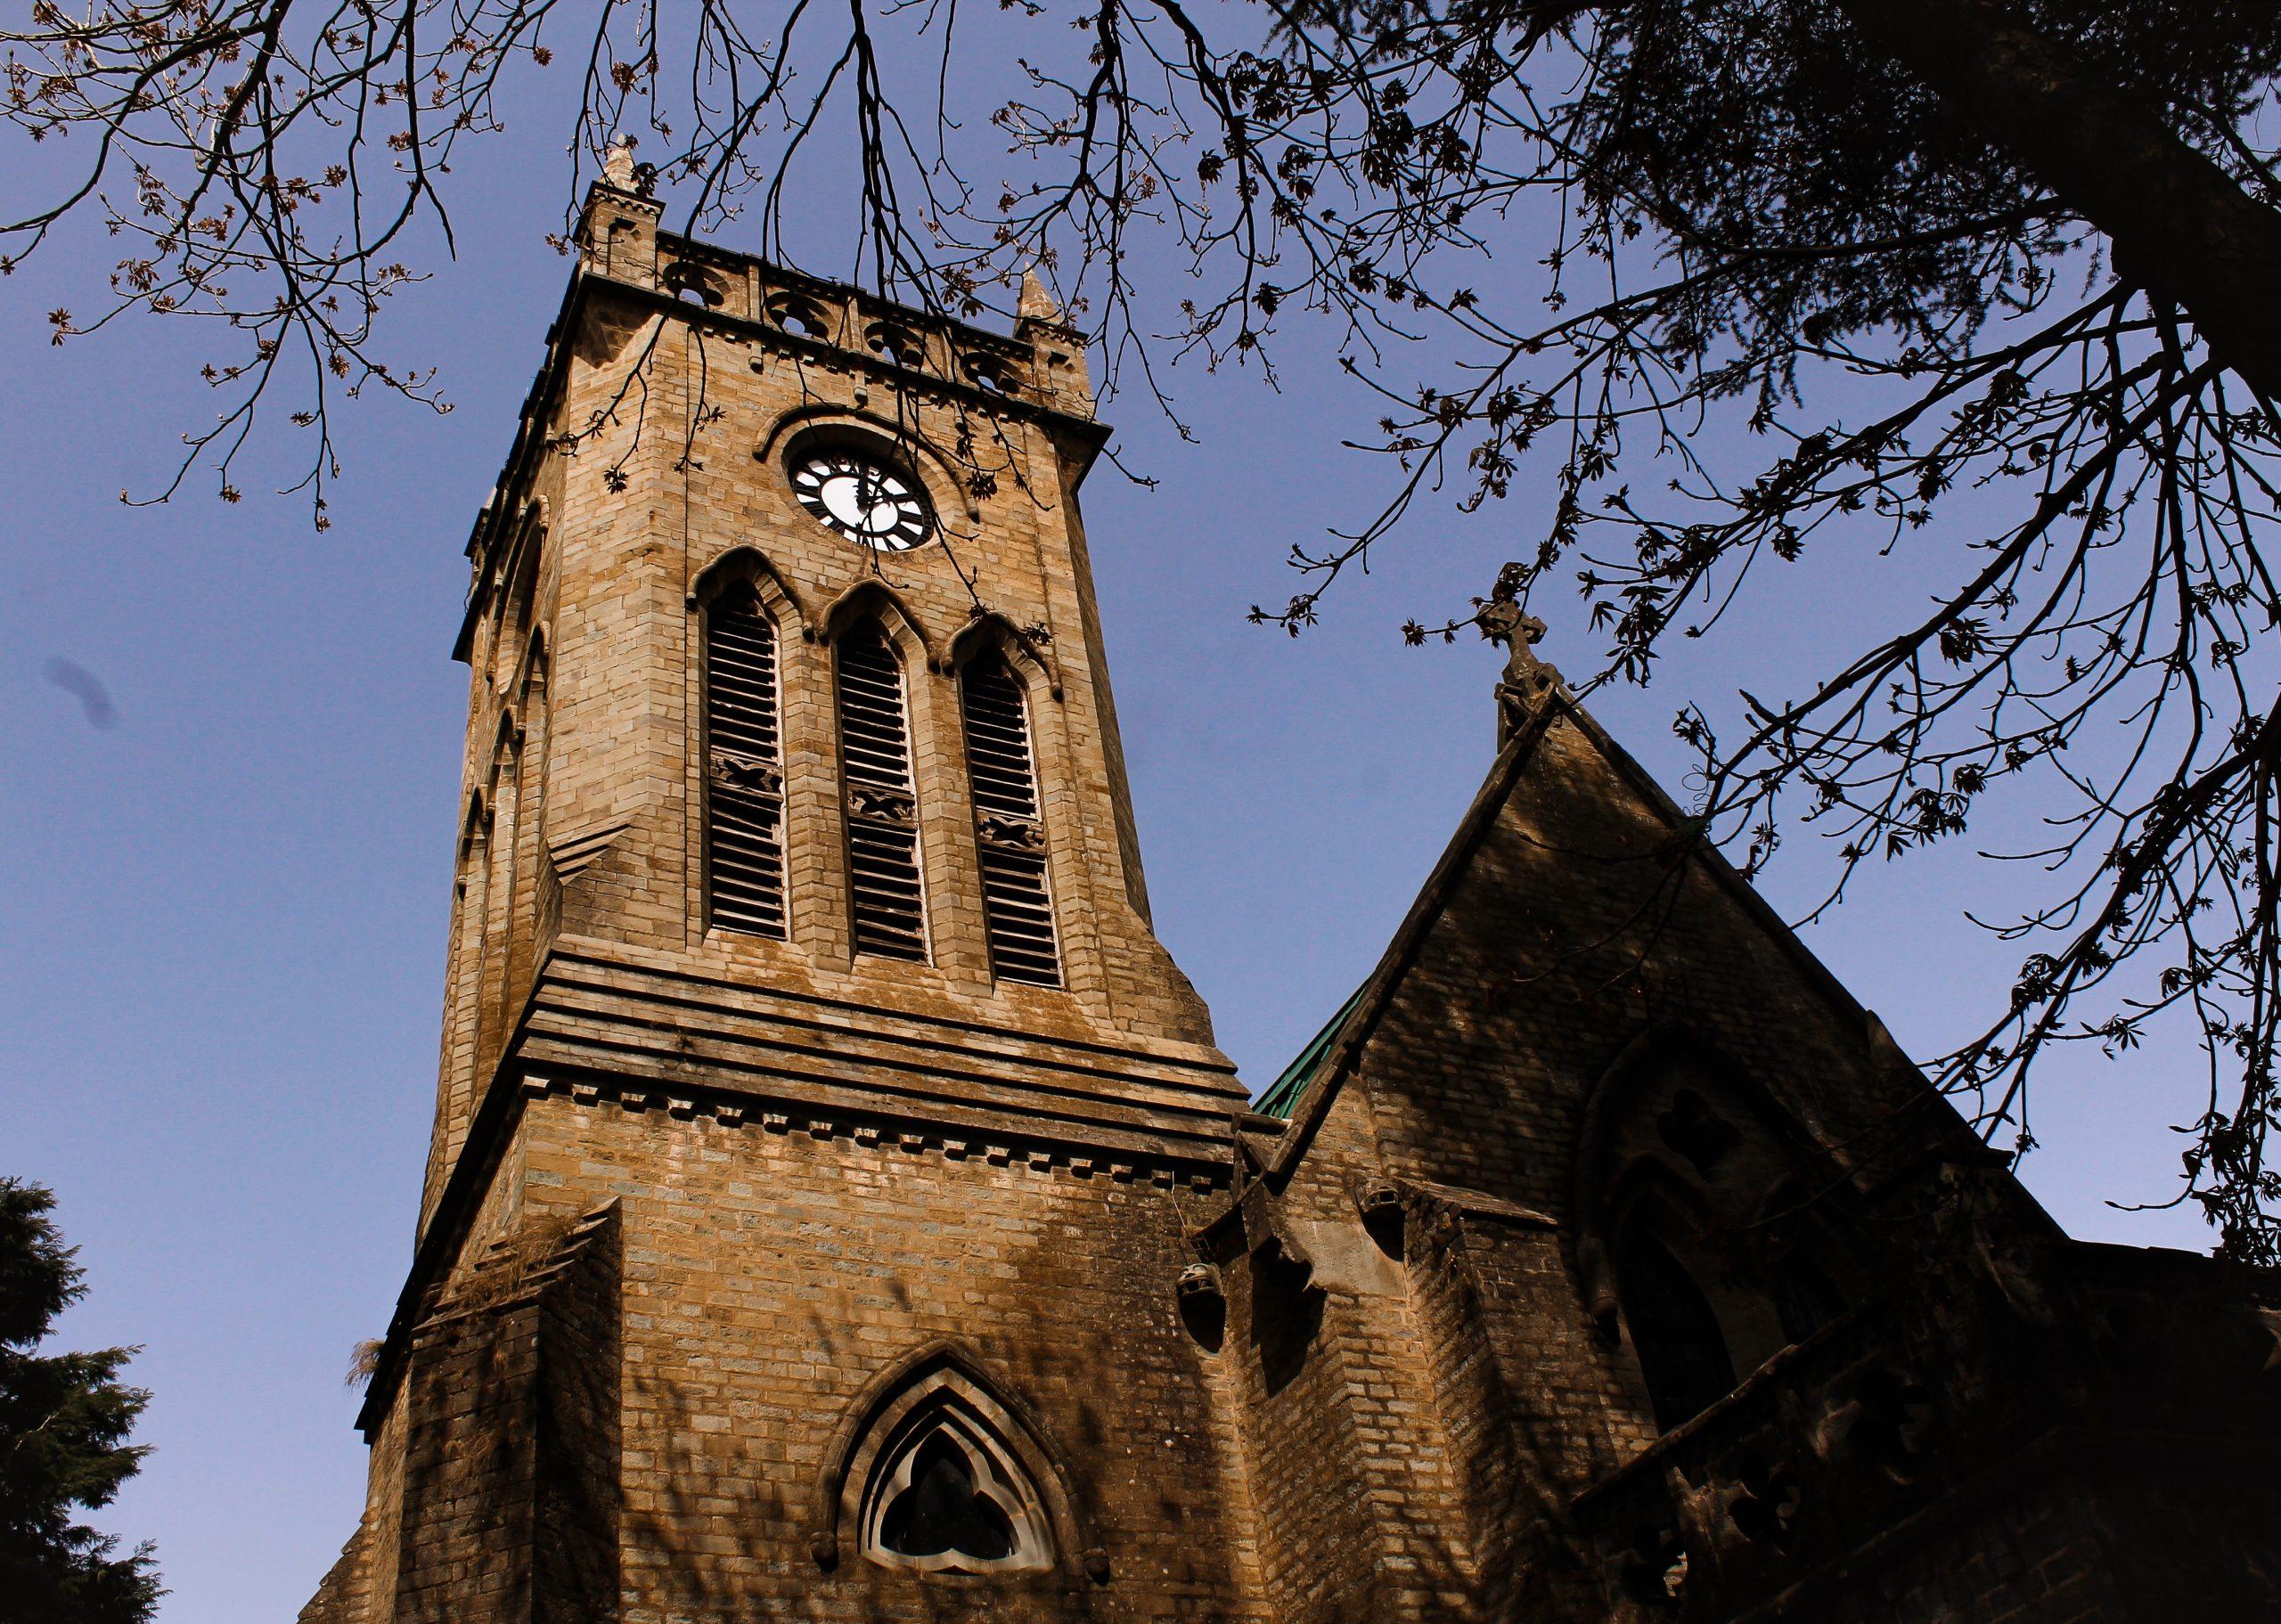 Clock tower of a church